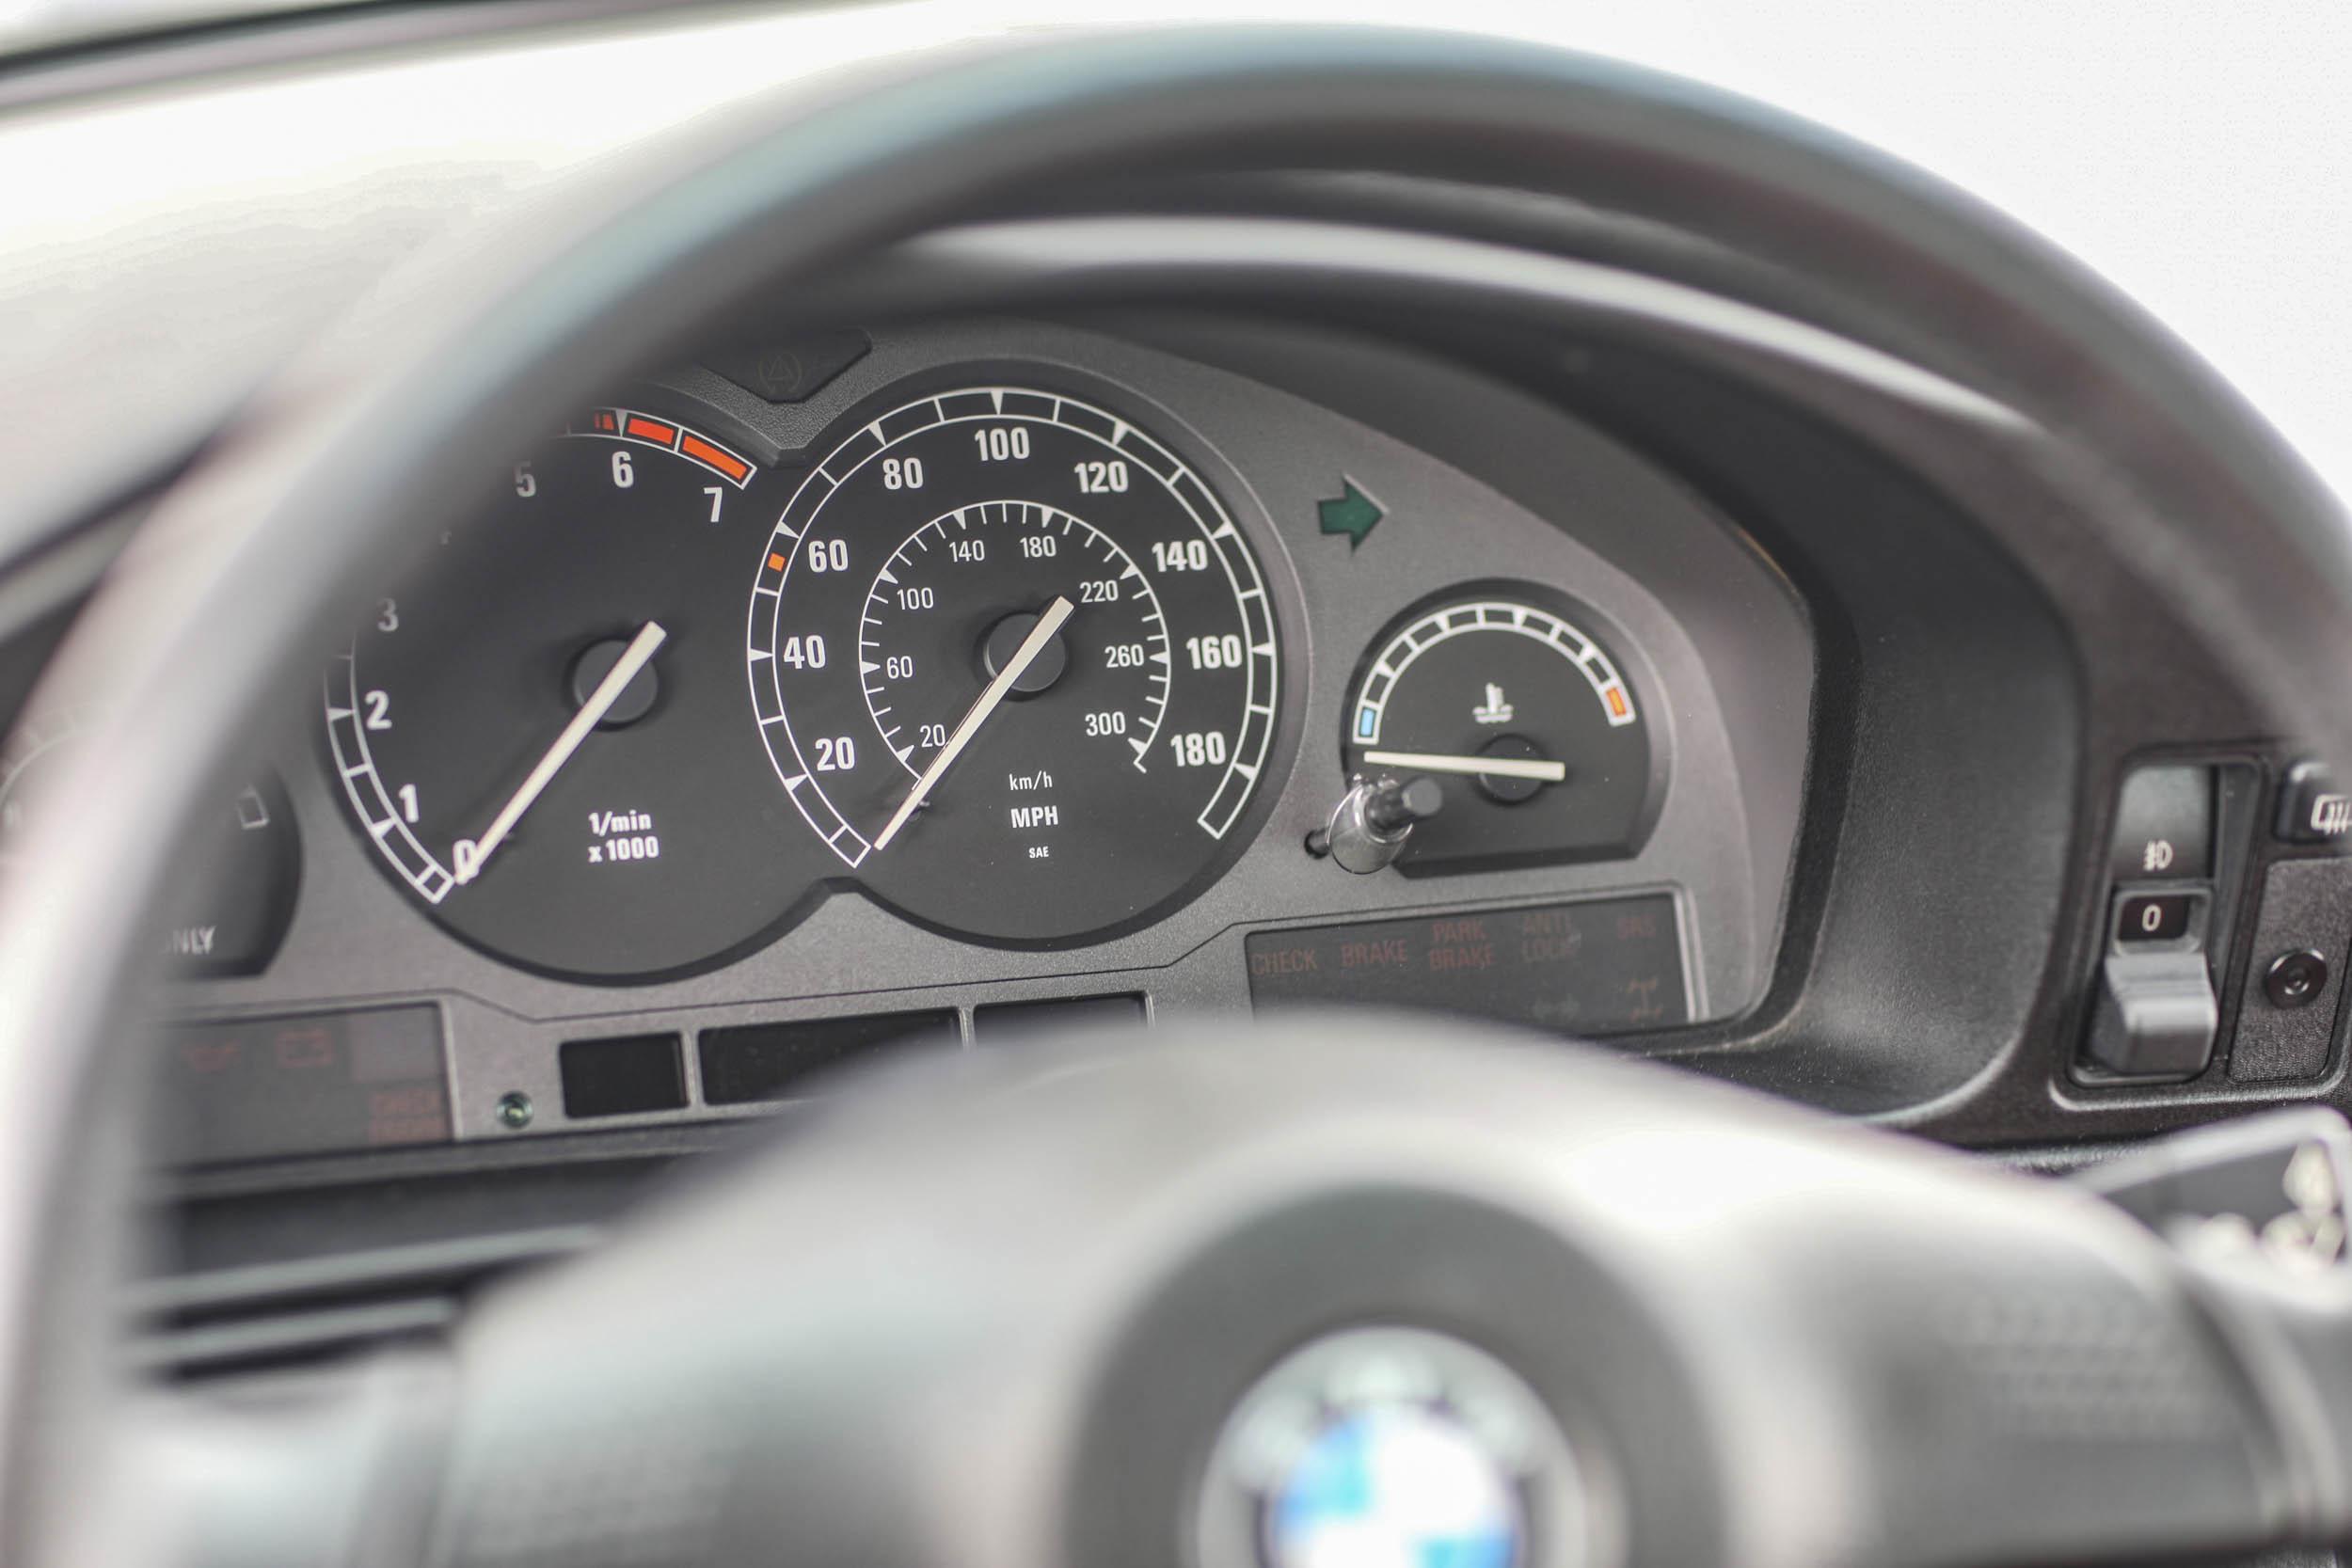 1993 BMW 850Ci guage cluster